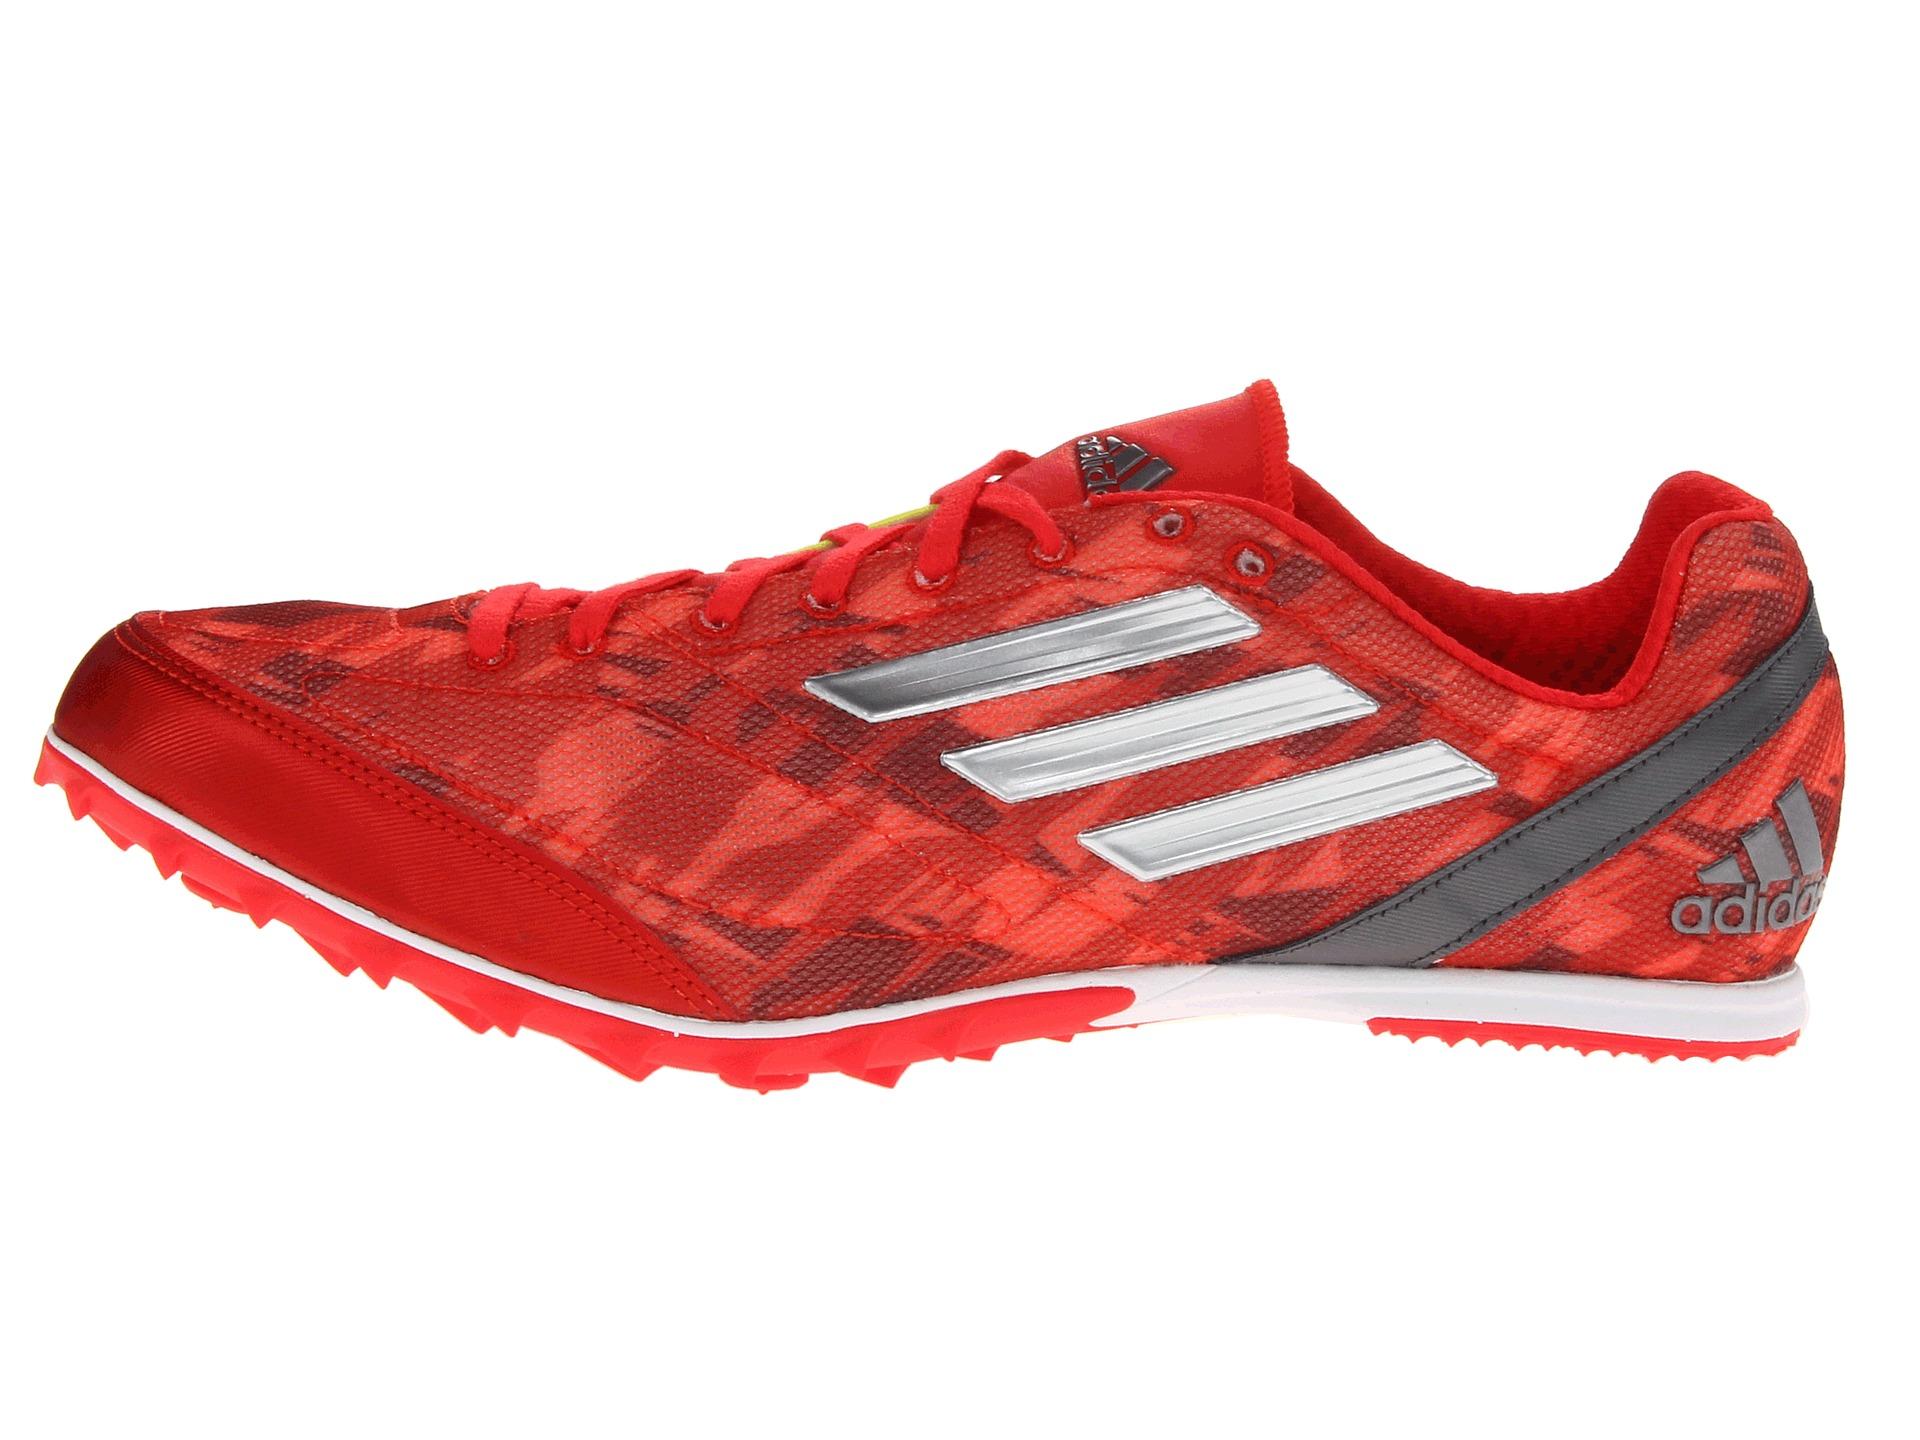 Adidas Running Xcs 3 Spikeless M Shipped Free At Zappos